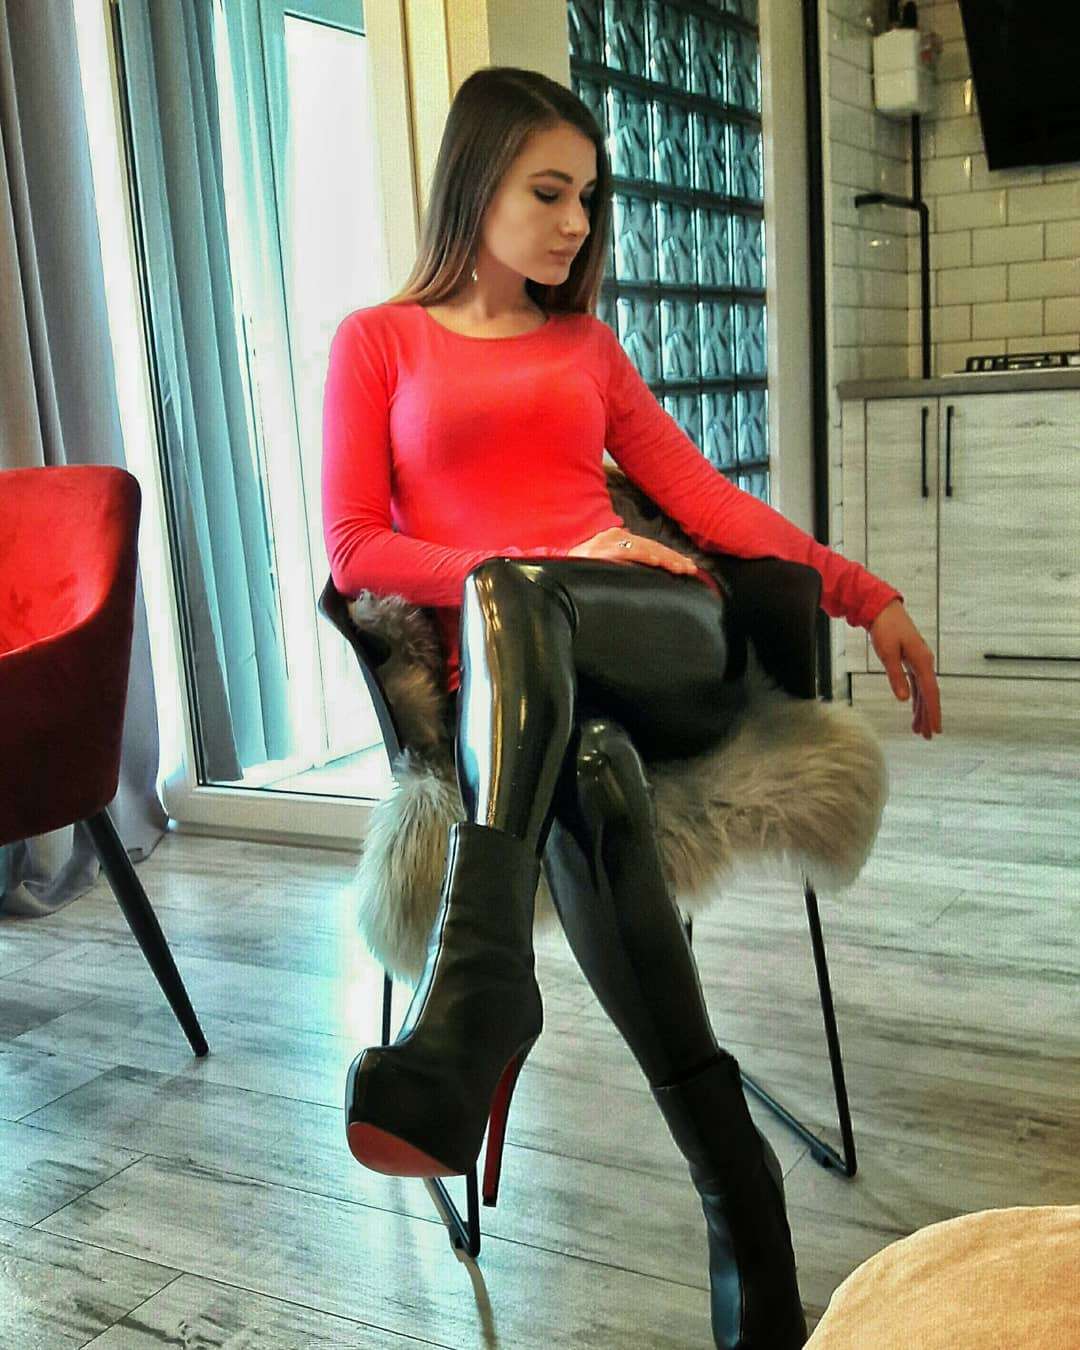 Olga-Madych-Wallpapers-Insta-Fit-Bio-1